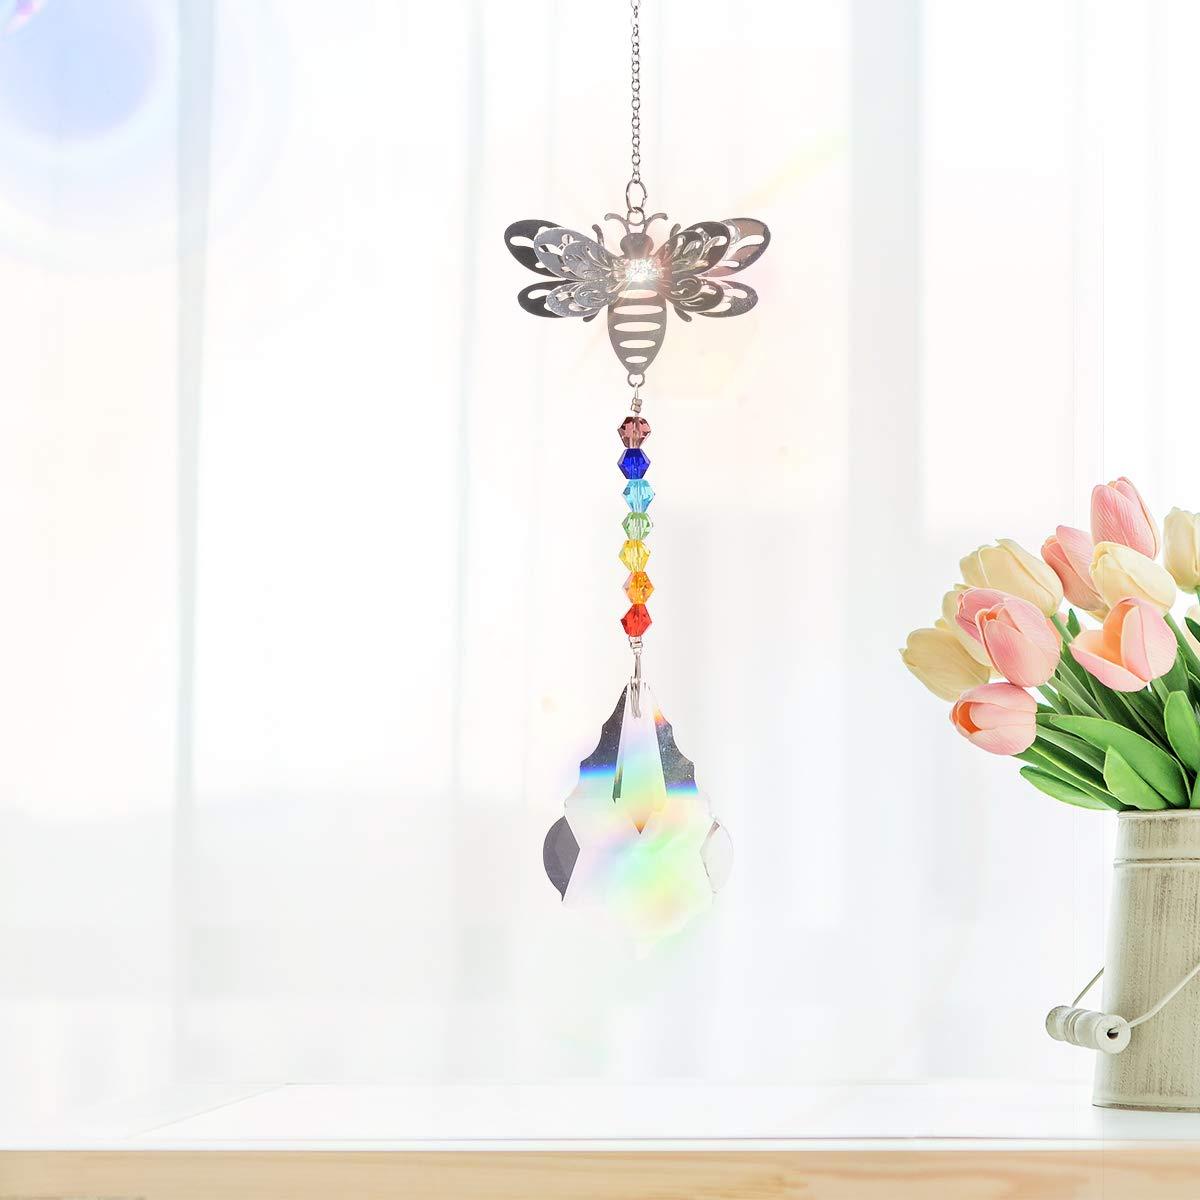 3D Metal Bee Fengshui Rainbow Maker Glass Chakra/Window Hanging Crystal Garden Suncatcher with Ball Pendant Pack of 2